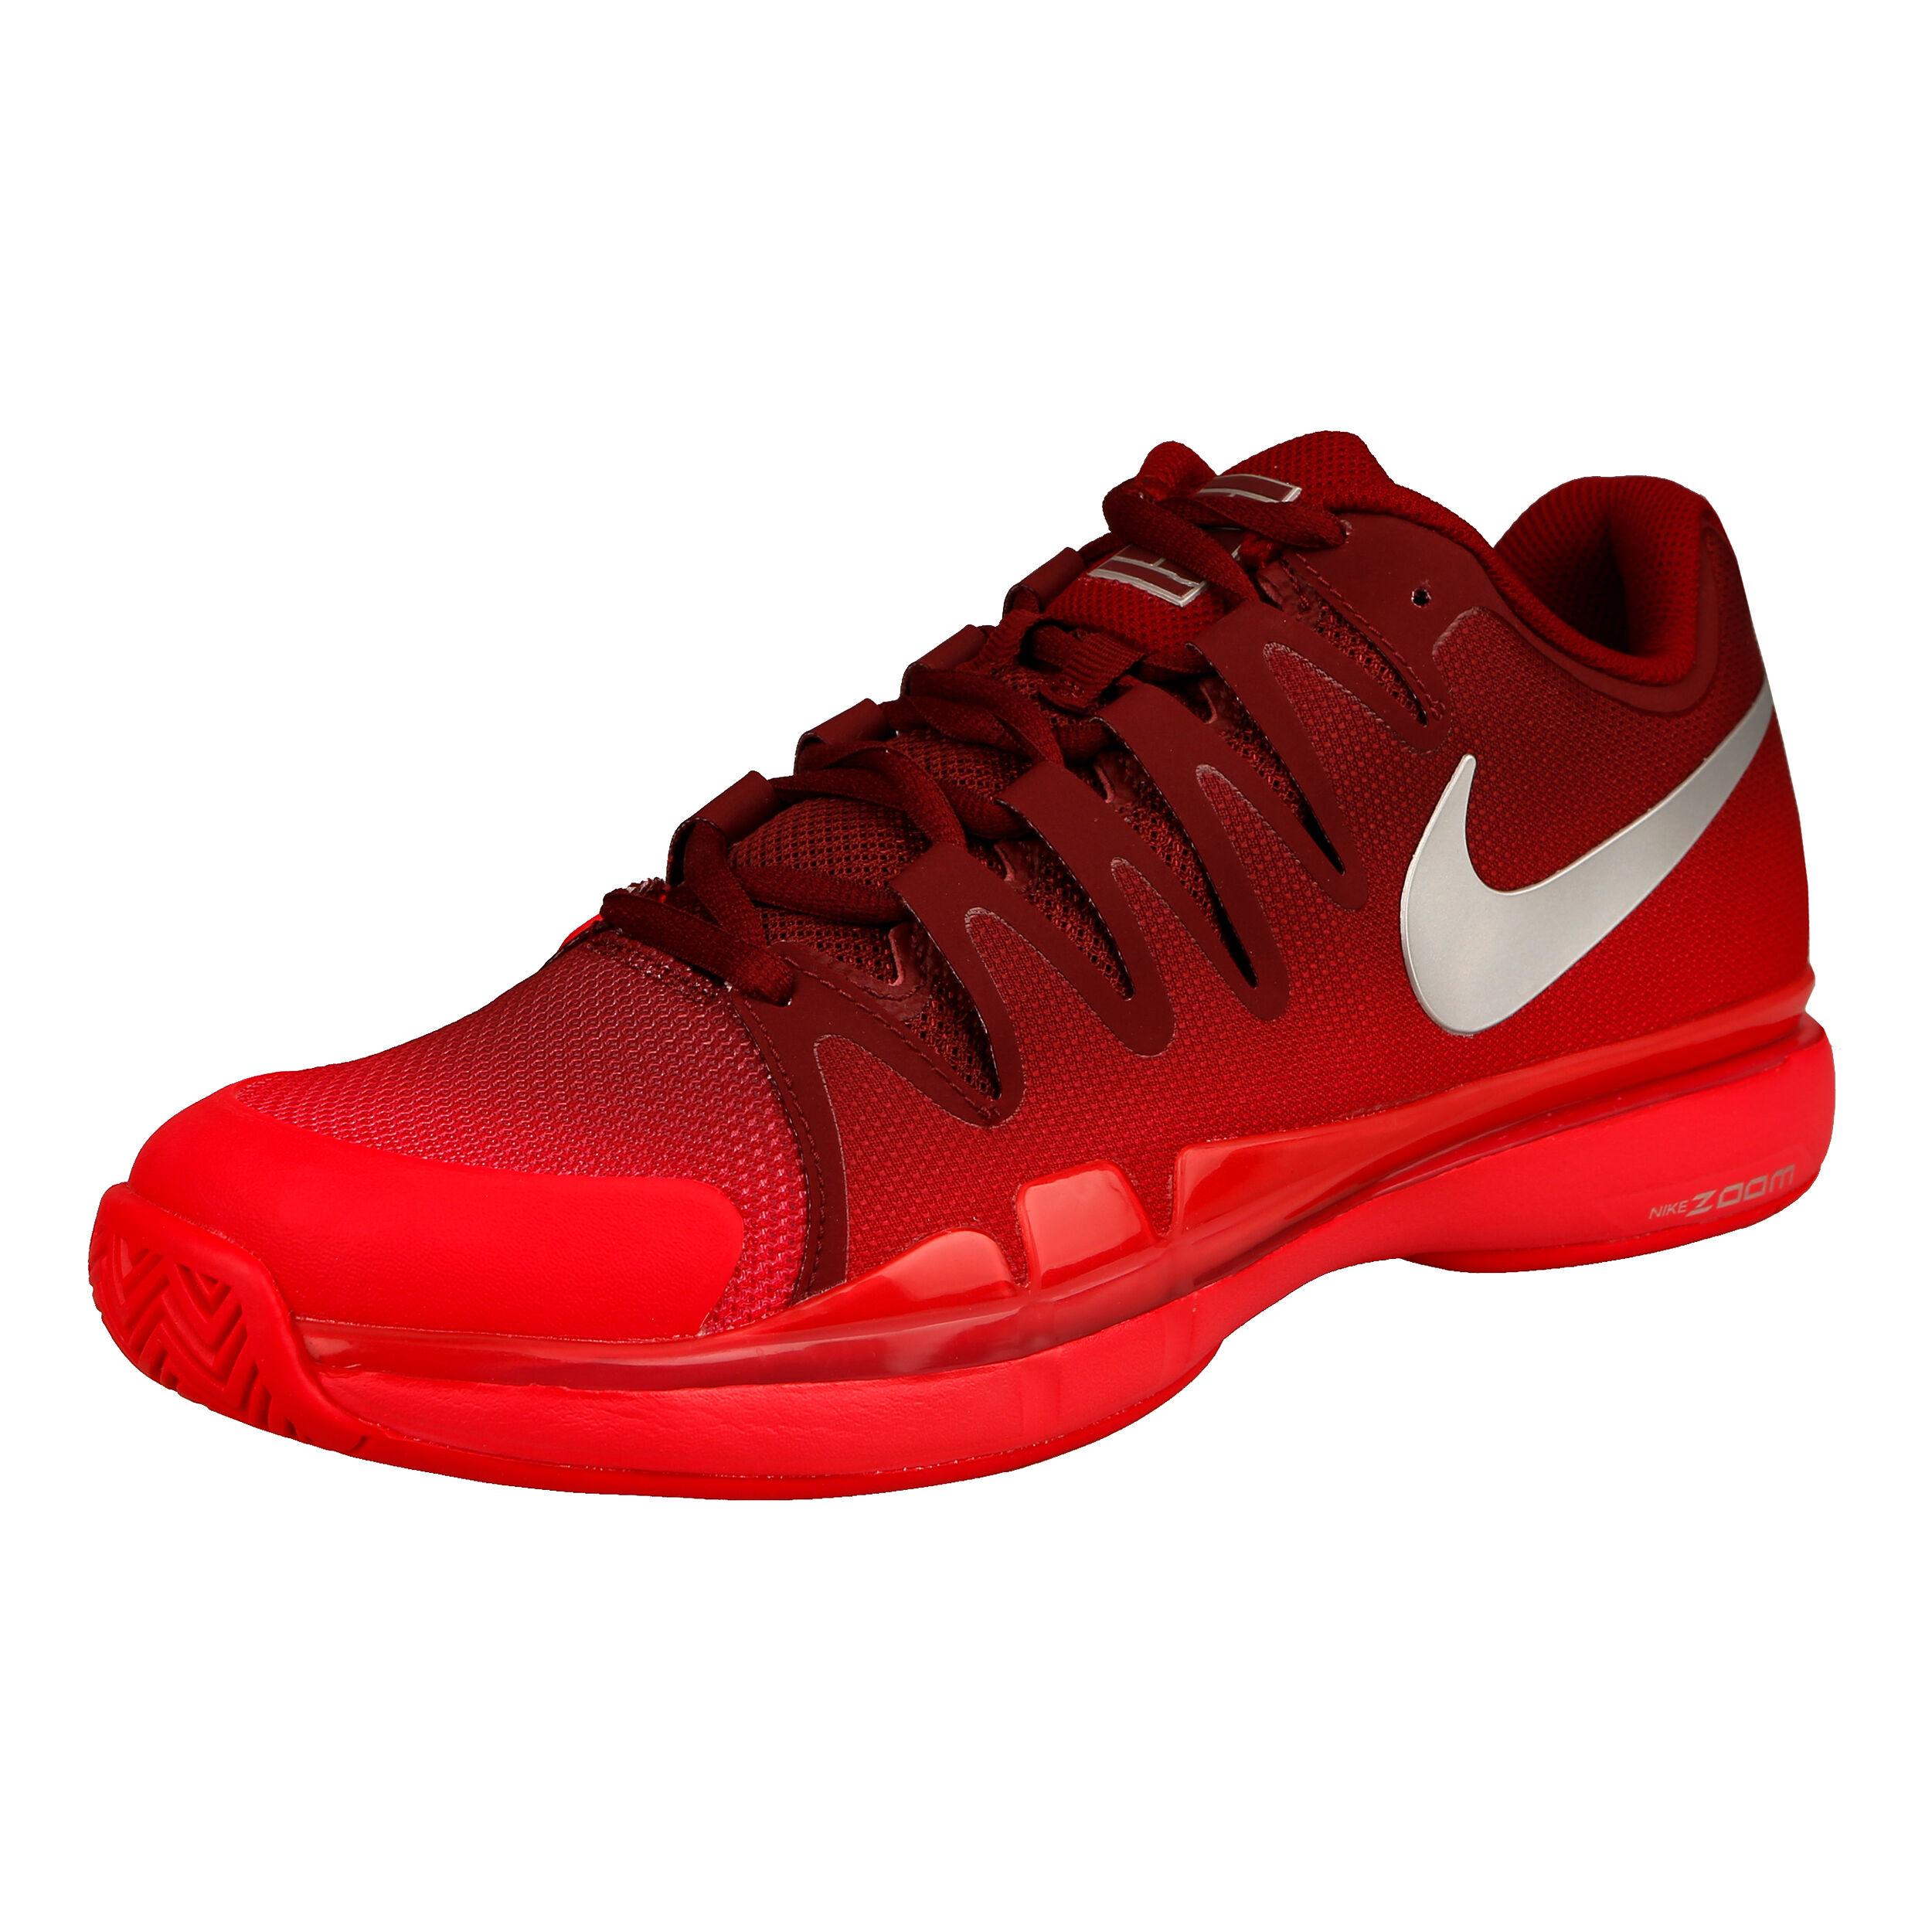 Nike Zoom Vapor 9.5 Tour All Court Shoe